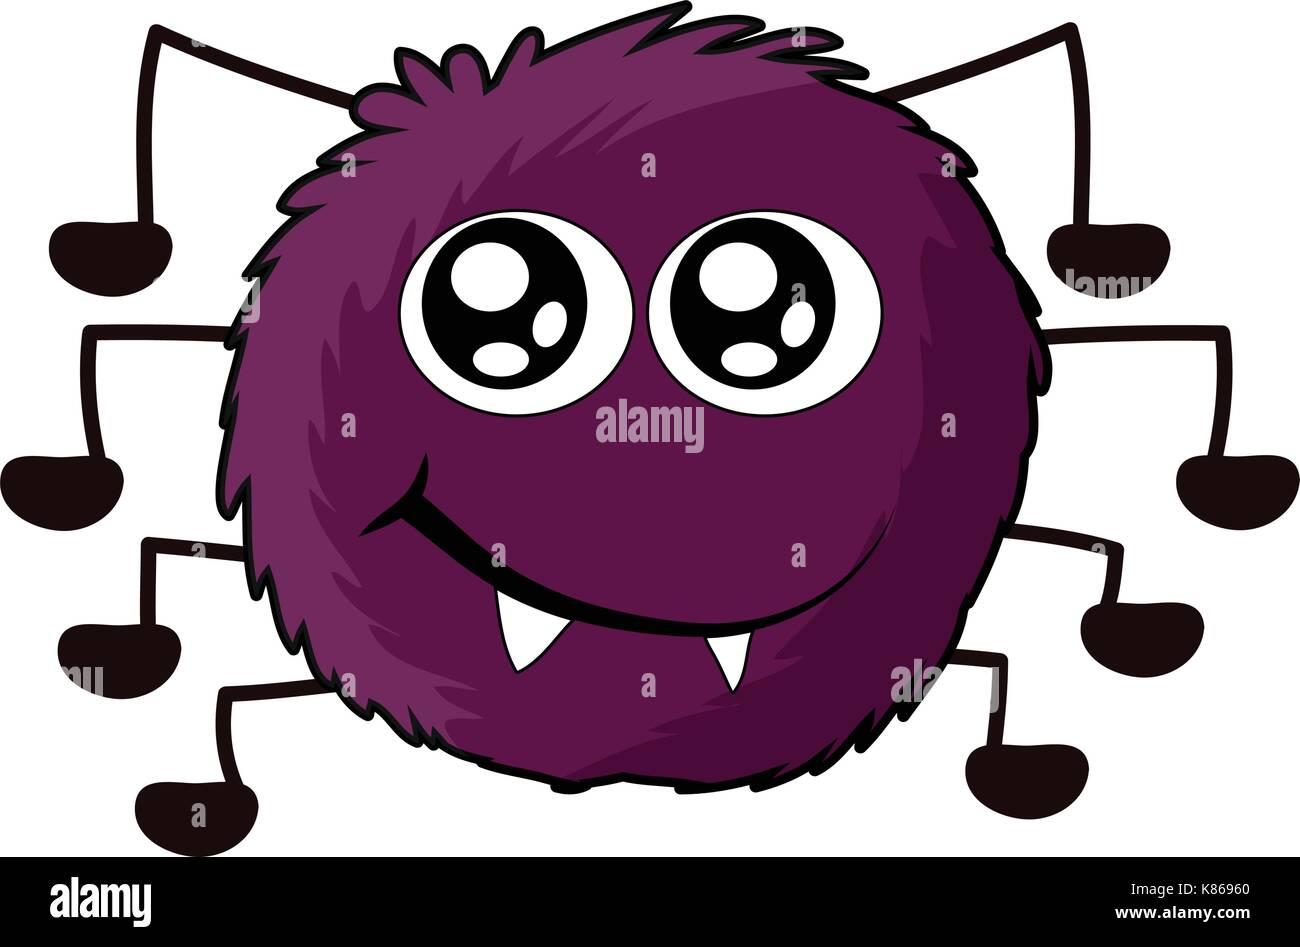 halloween spider vector symbol icon design. Beautiful illustration isolated on white background - Stock Image